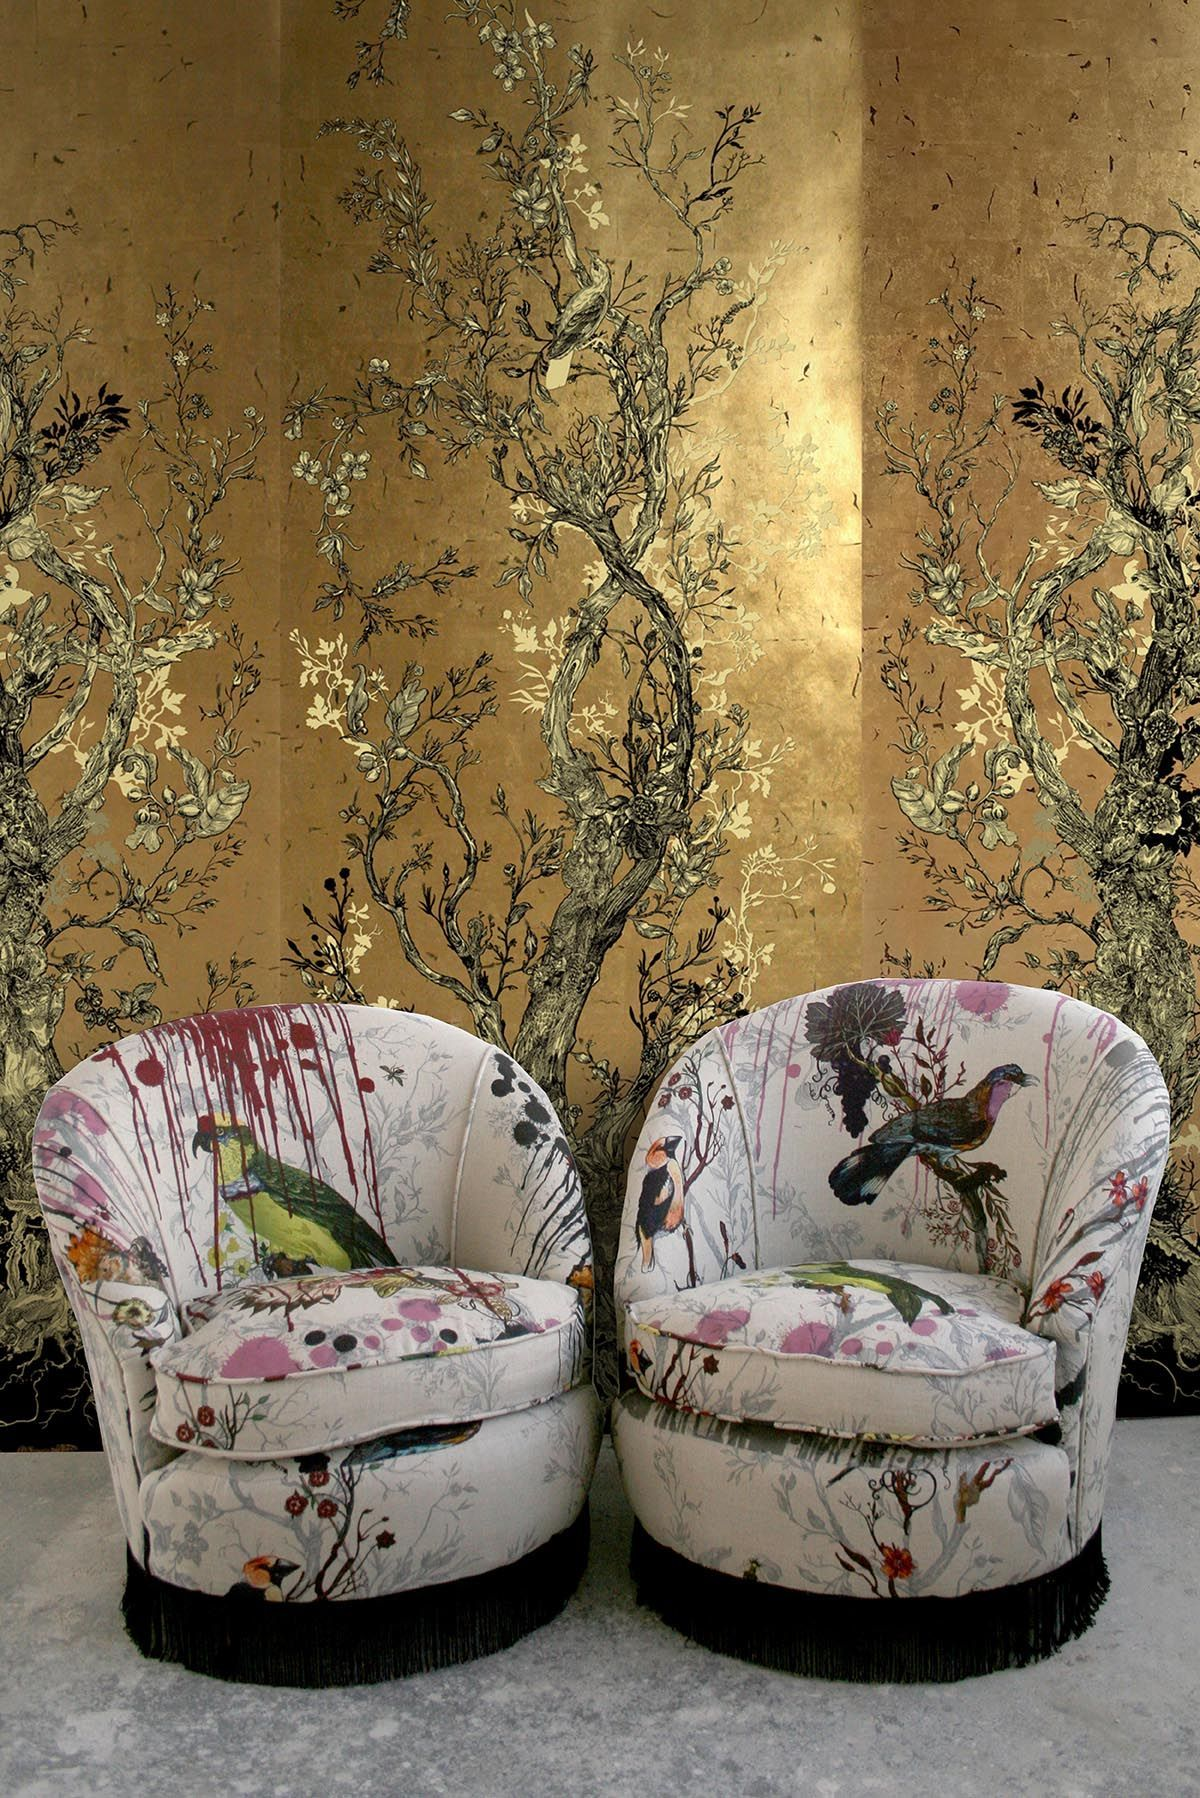 Living Room Inspiration - Wallcoverings Golden Oriole BLACK & GOLD ON GOLD £1,080.00 EACH